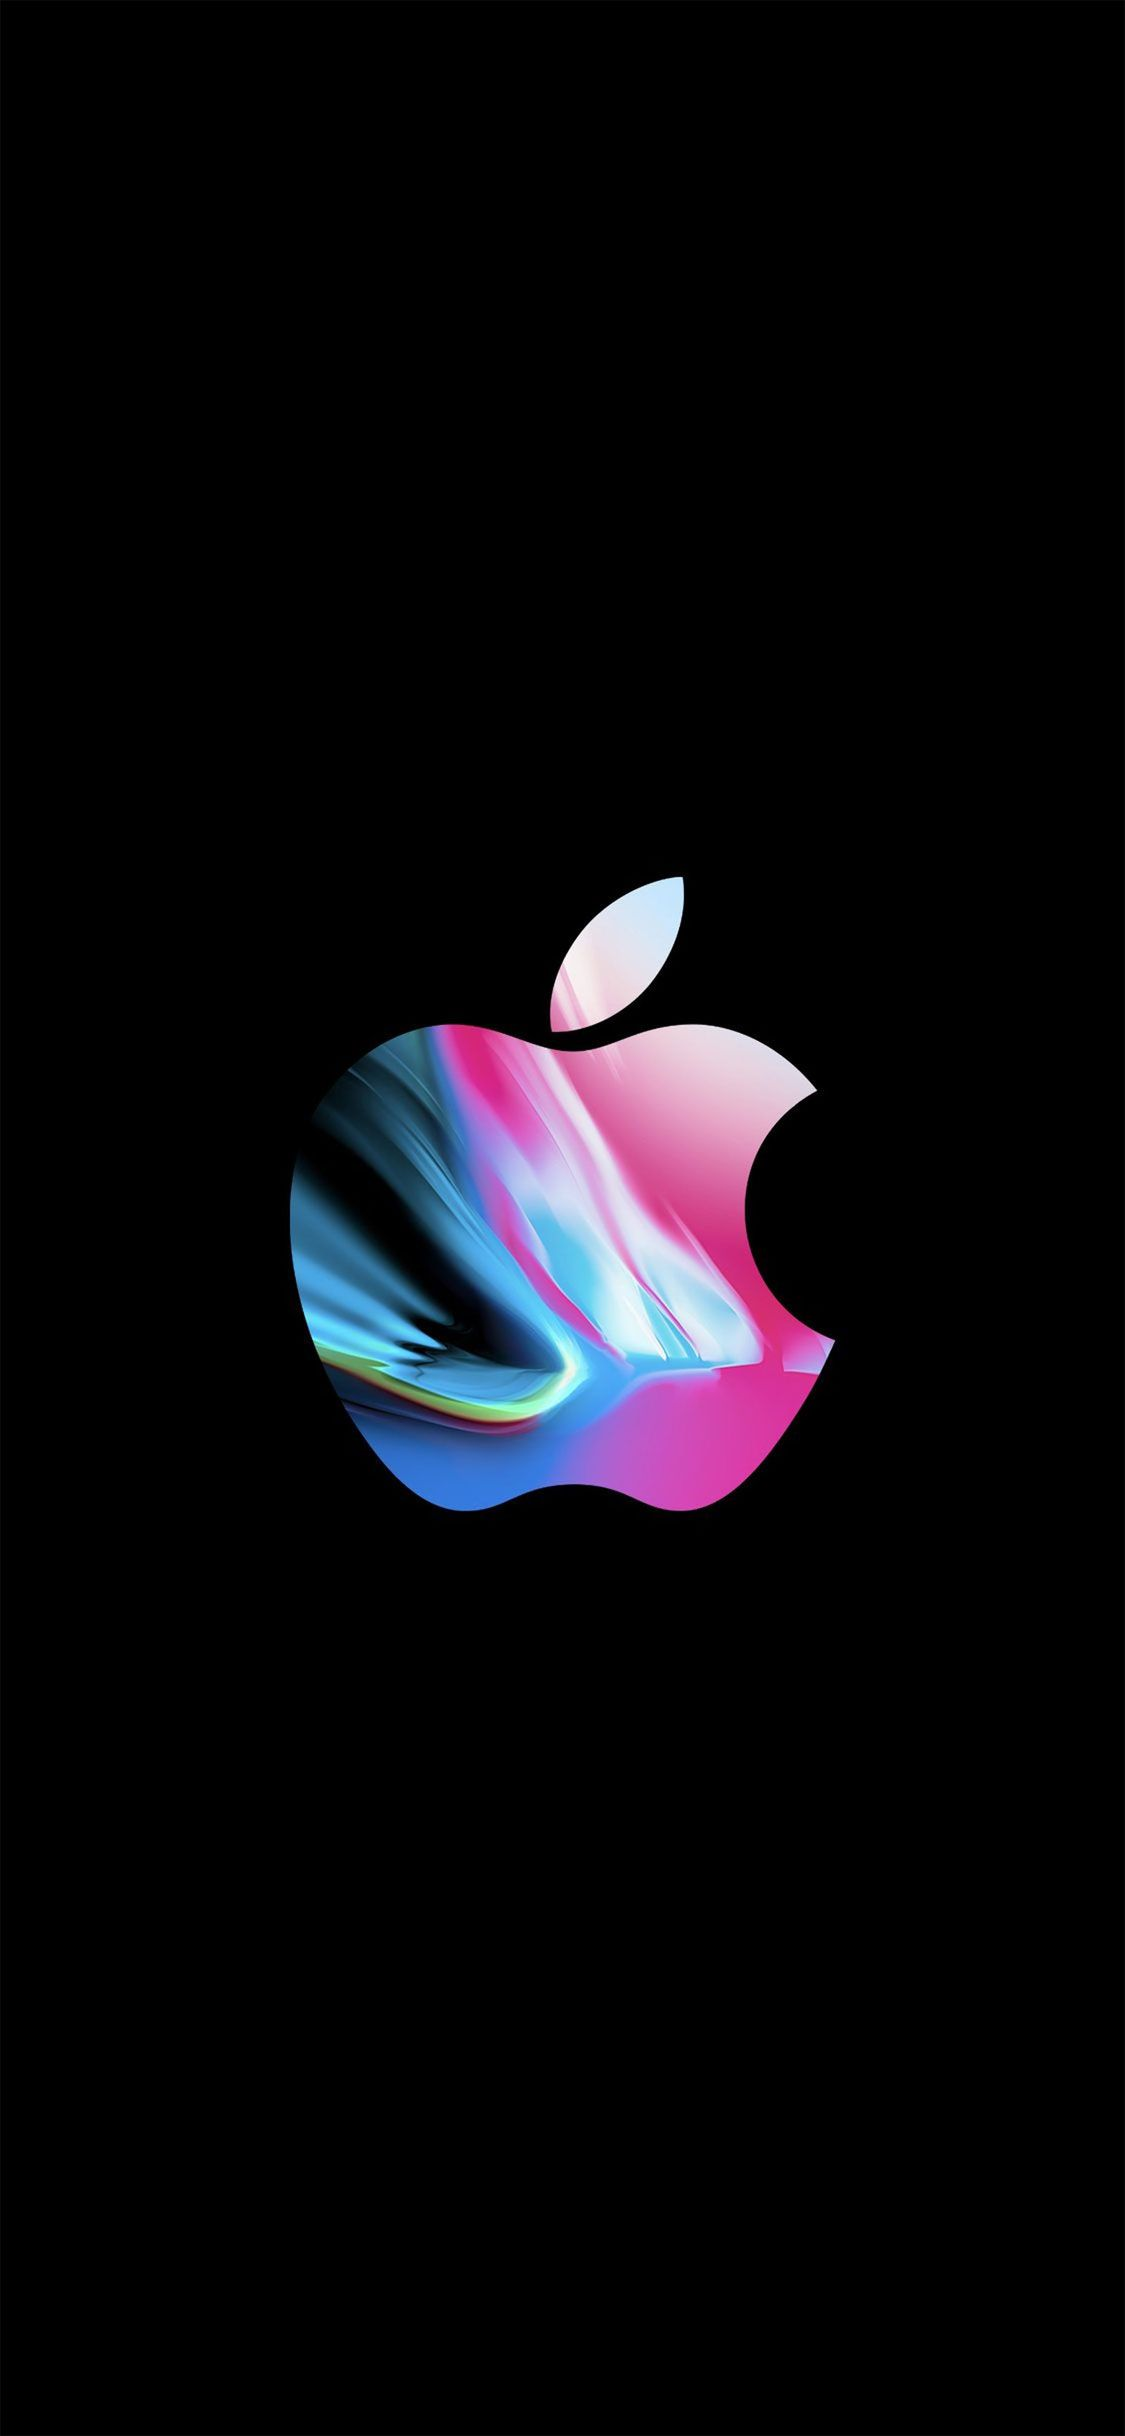 iPhone X Wallpaper (7)